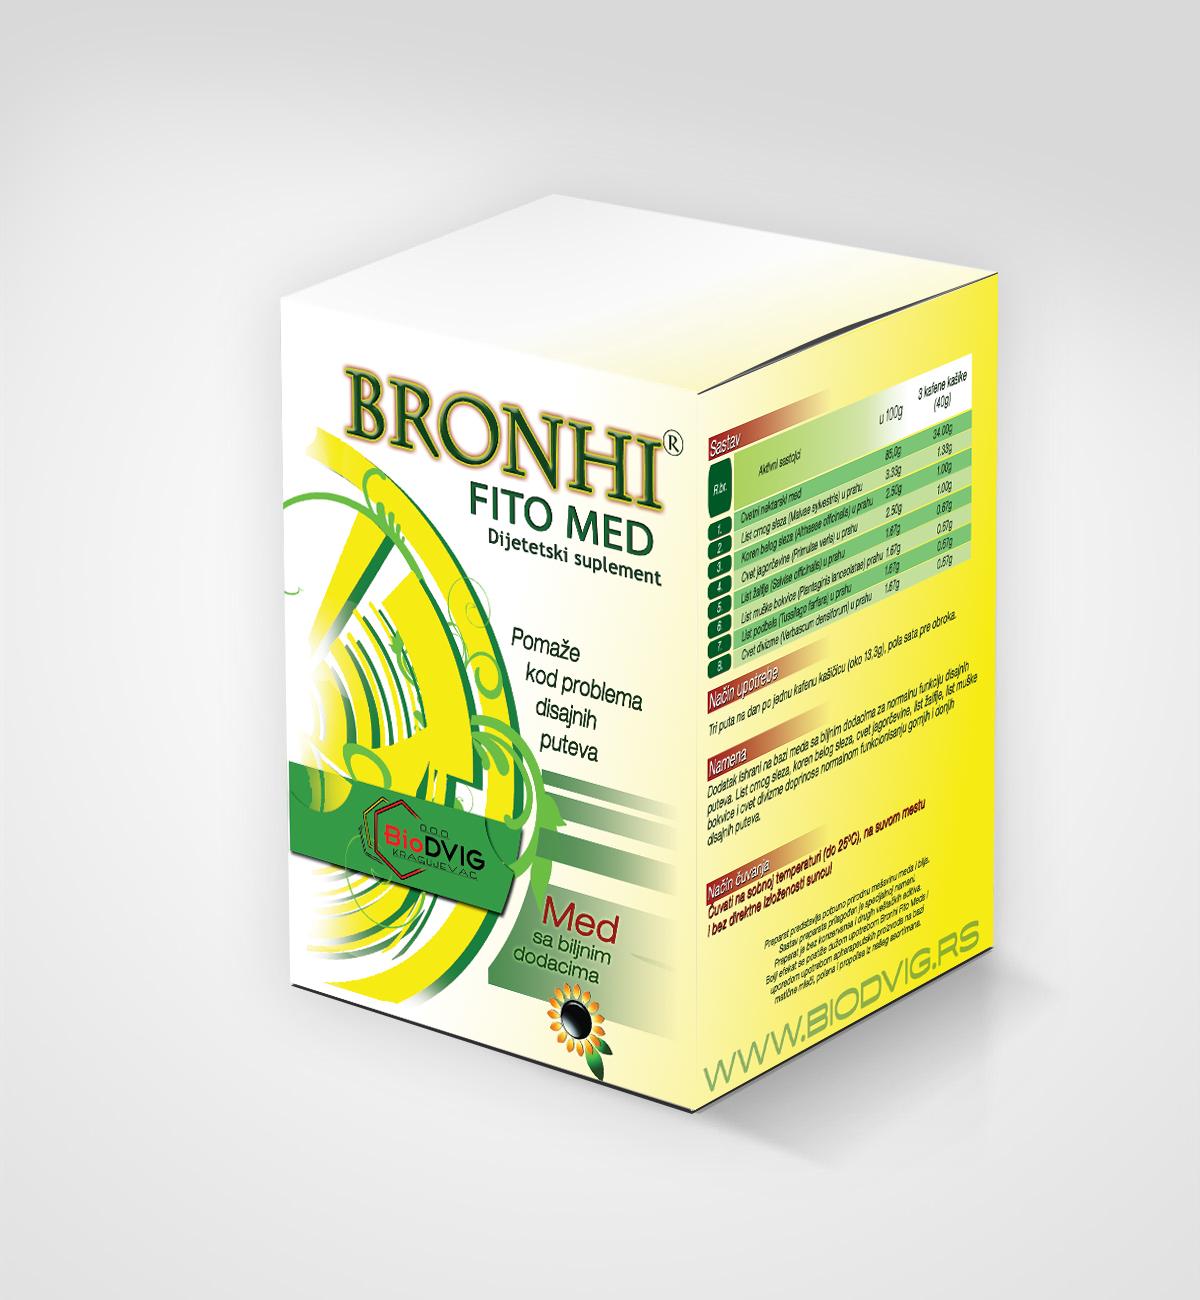 Bronhi fito med - Biodvig DOO